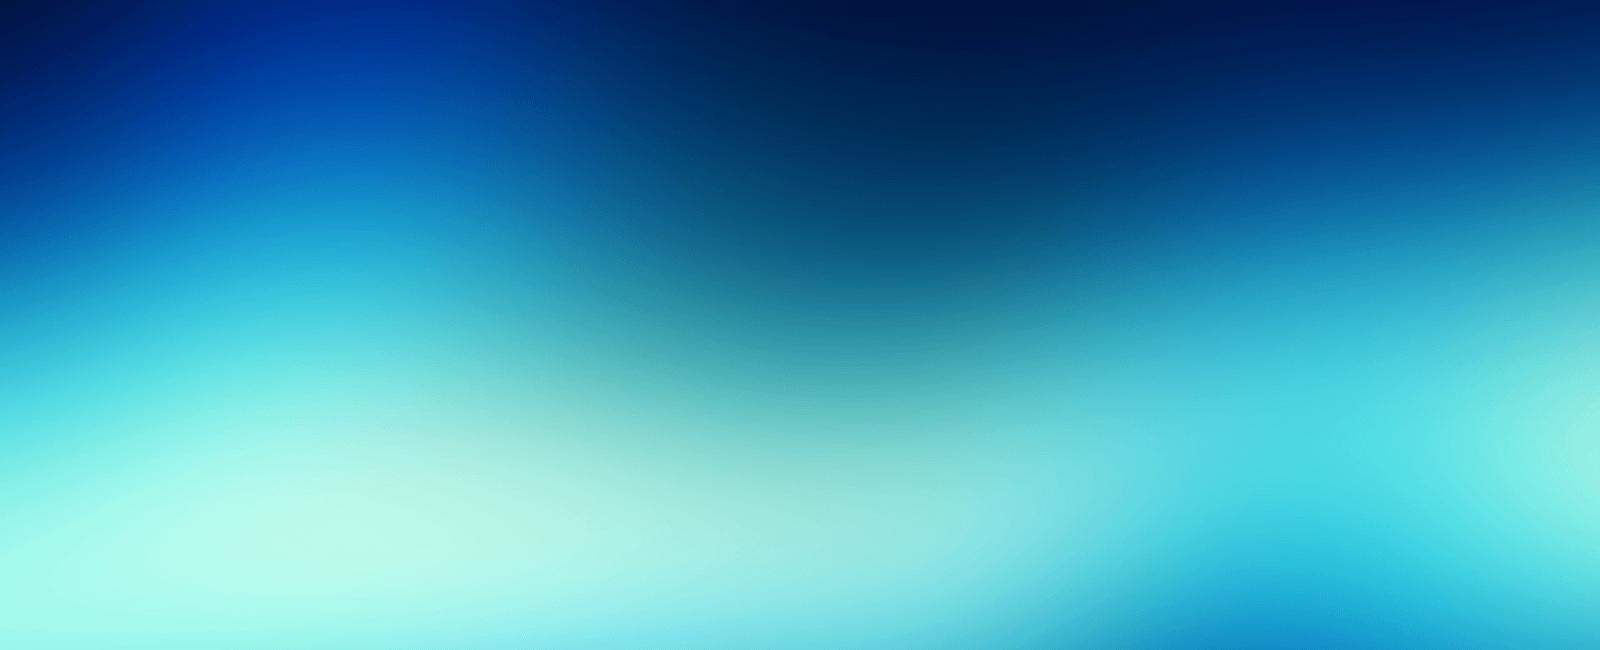 bg-blur-blue